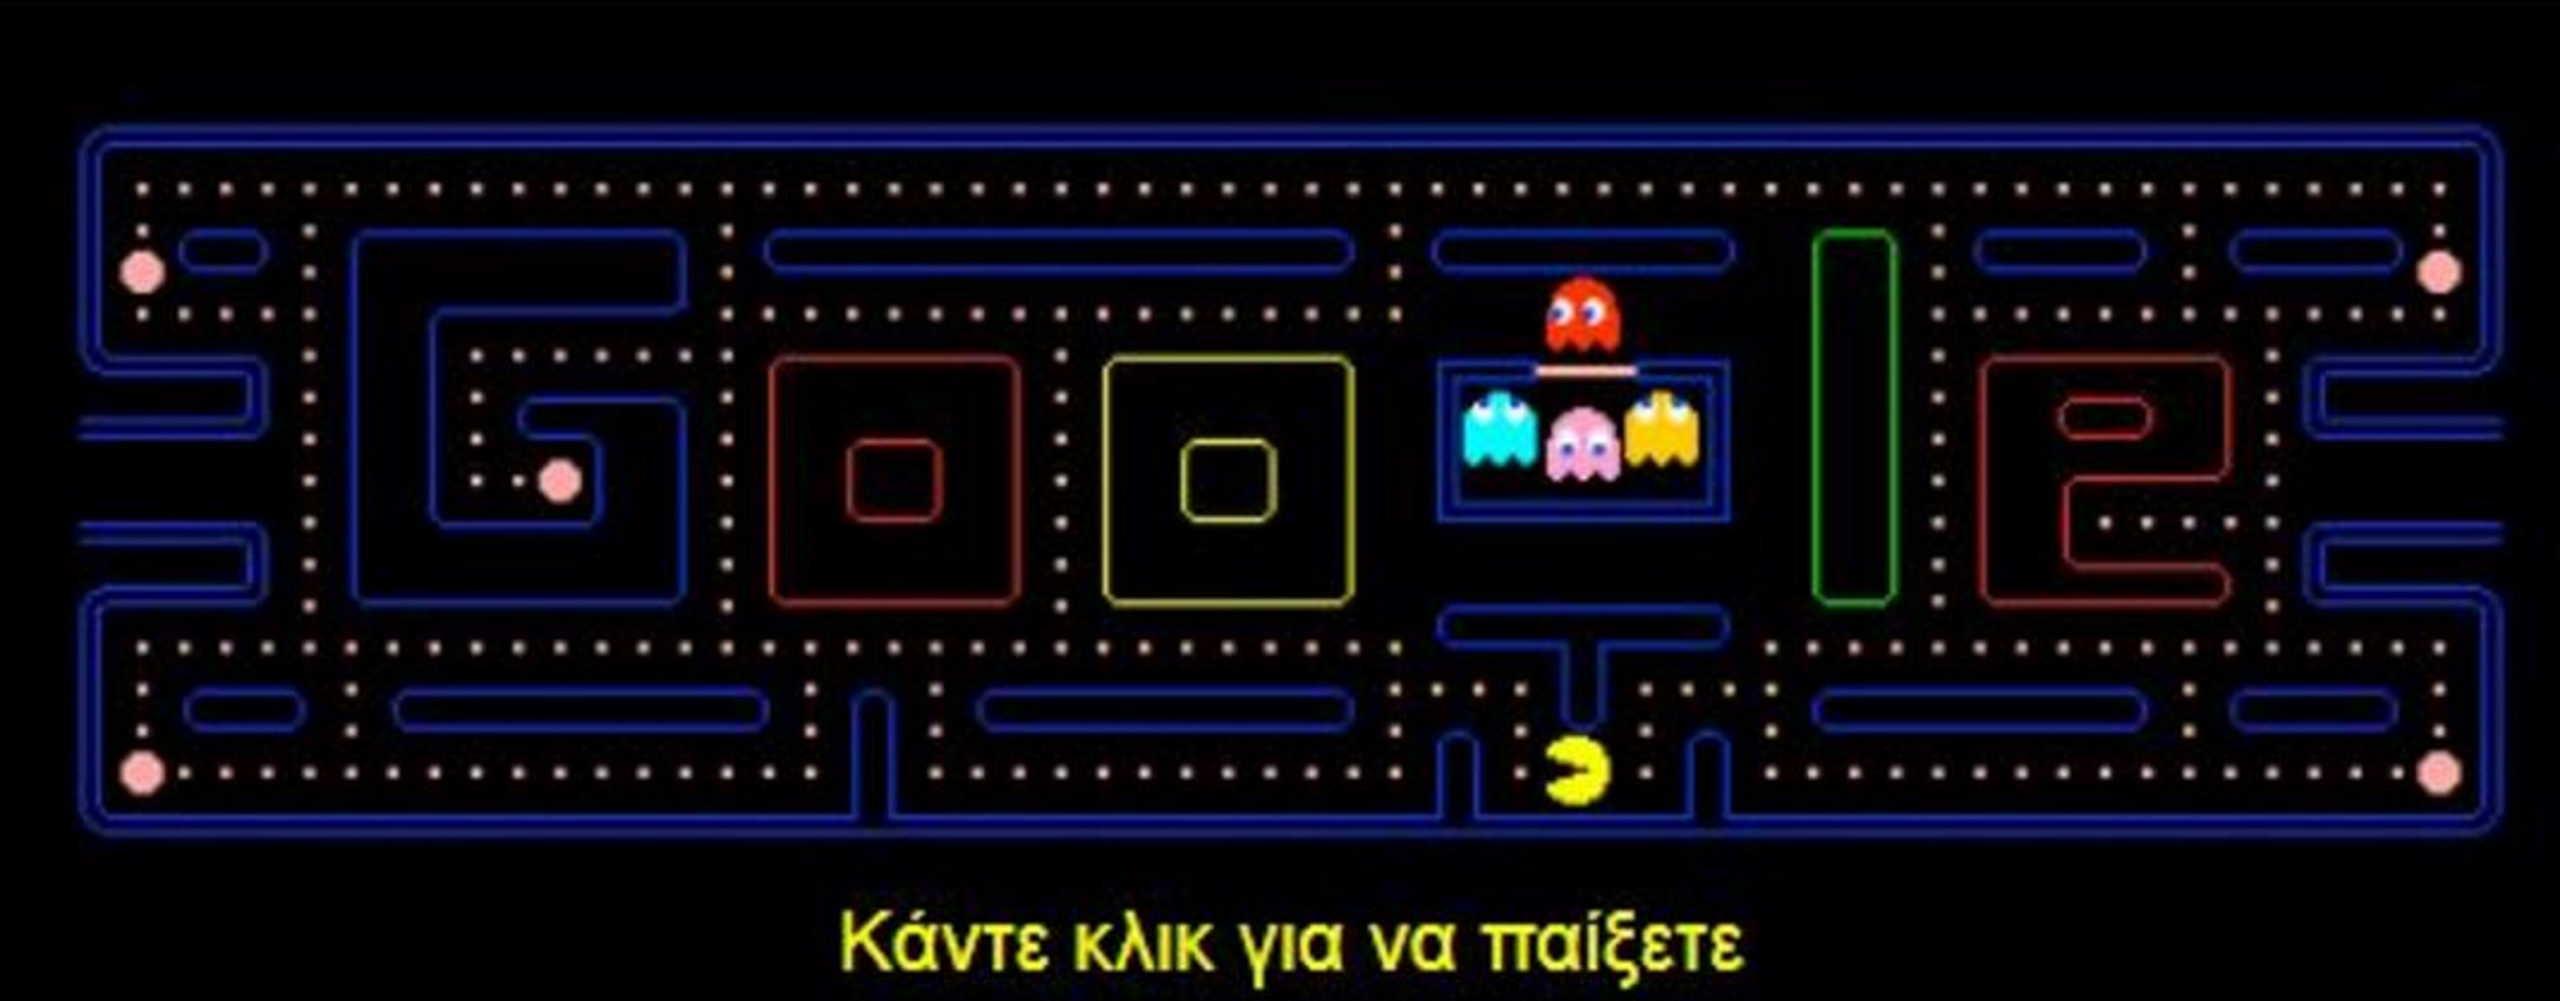 "Pac-Man: Το δημοφιλέστερο ηλεκτρονικό παιχνίδι ""σβήνει"" 40 κεράκια"